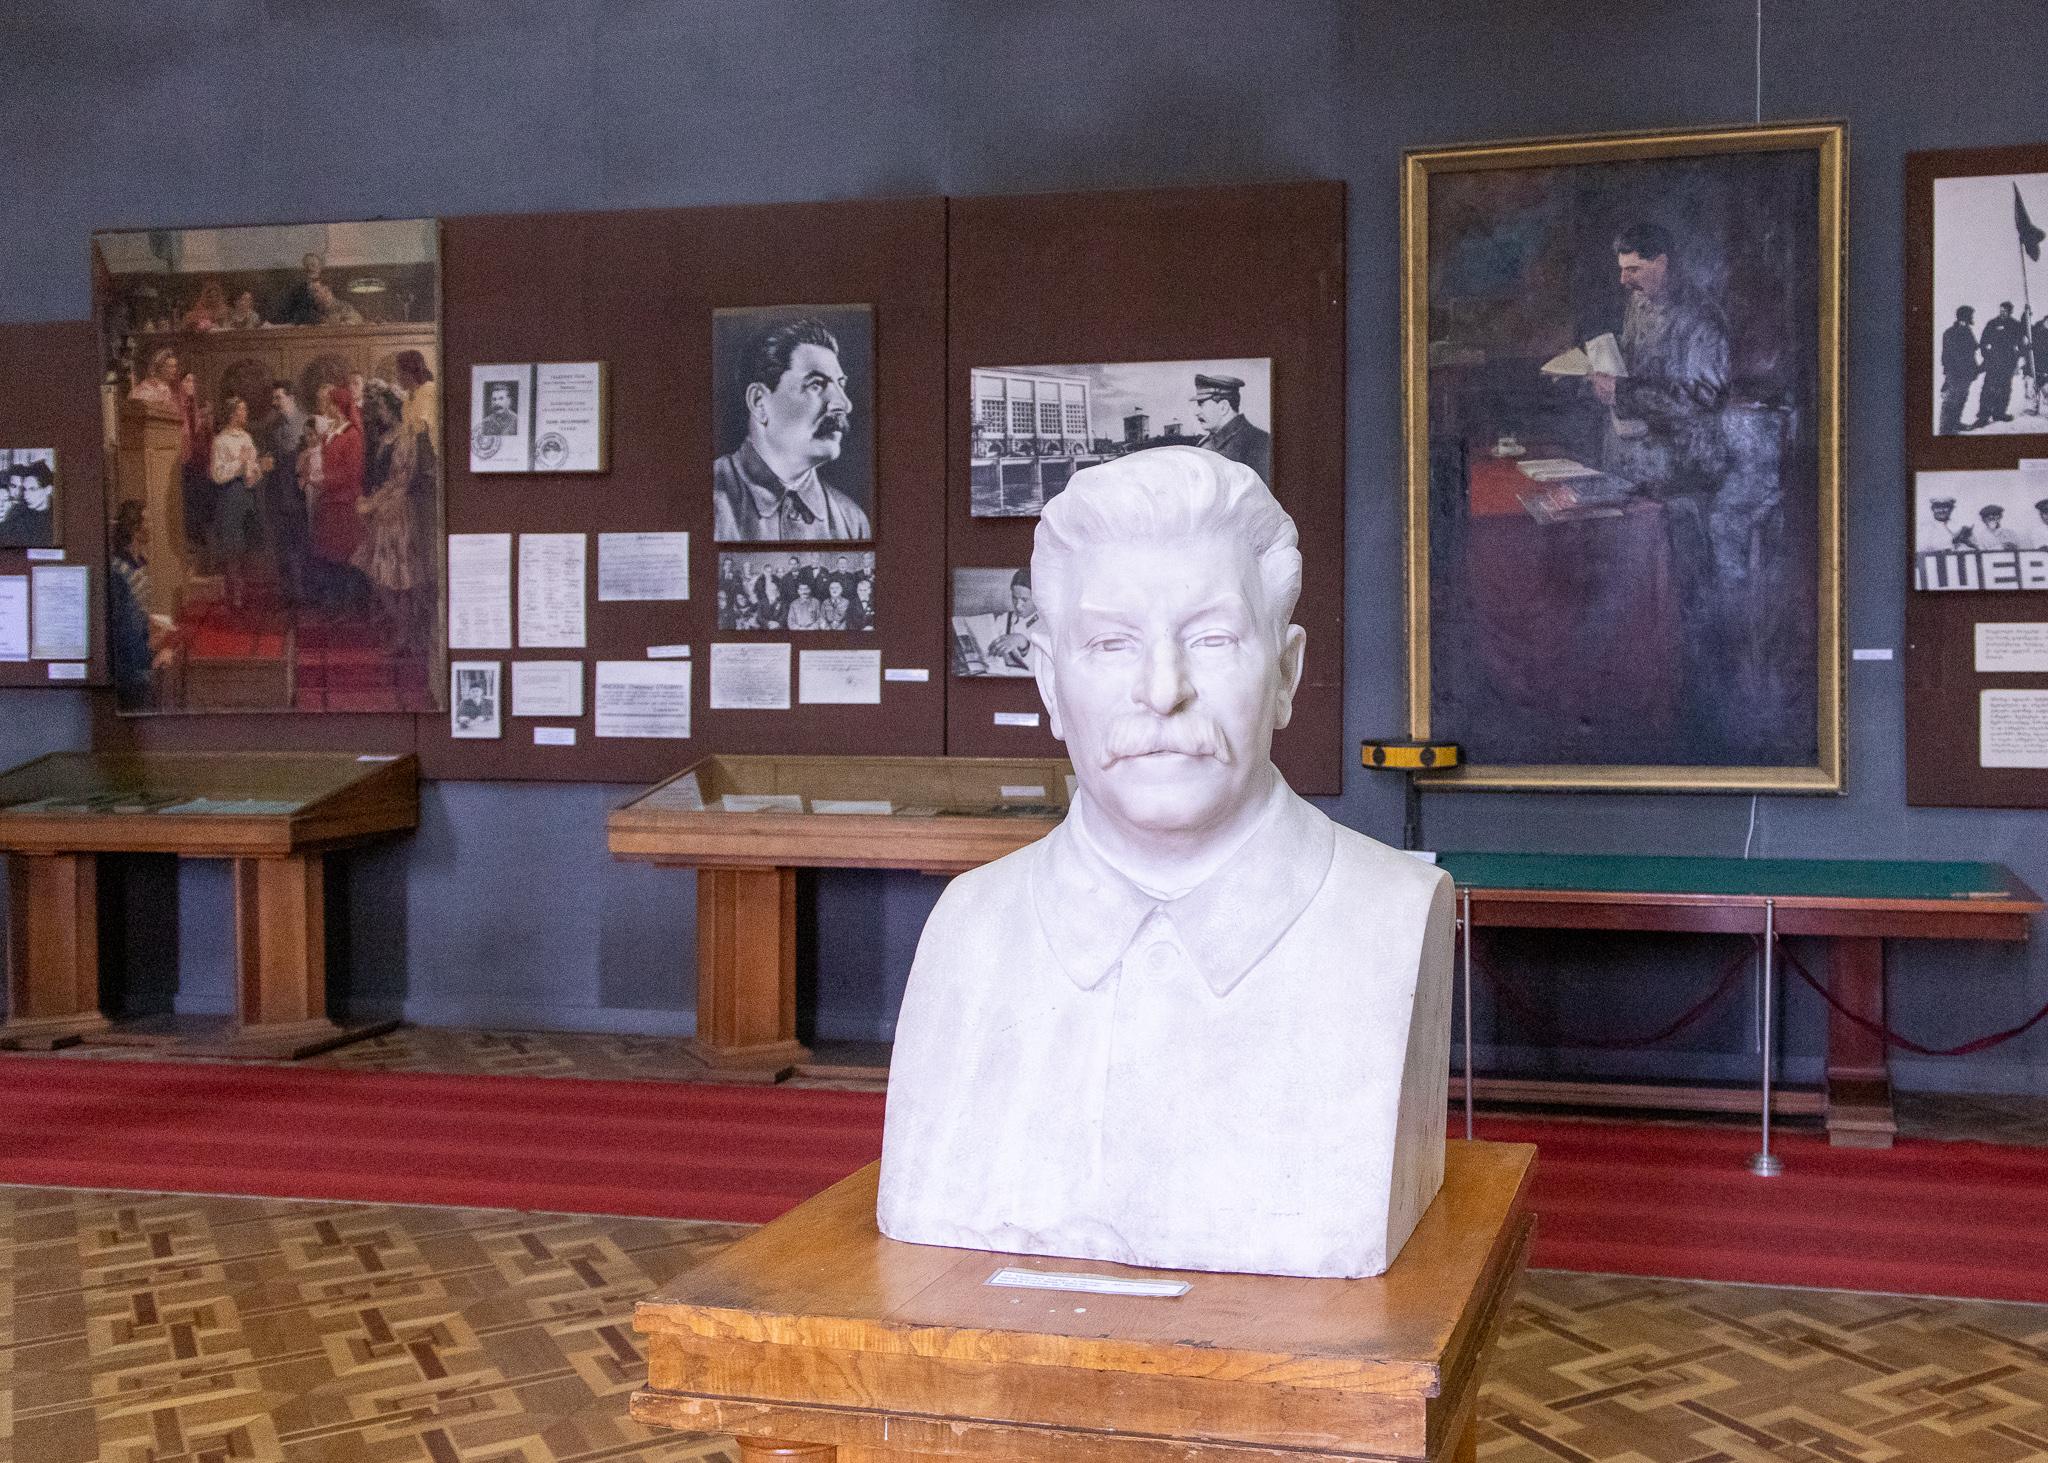 Stalin/Jugashvili, the man